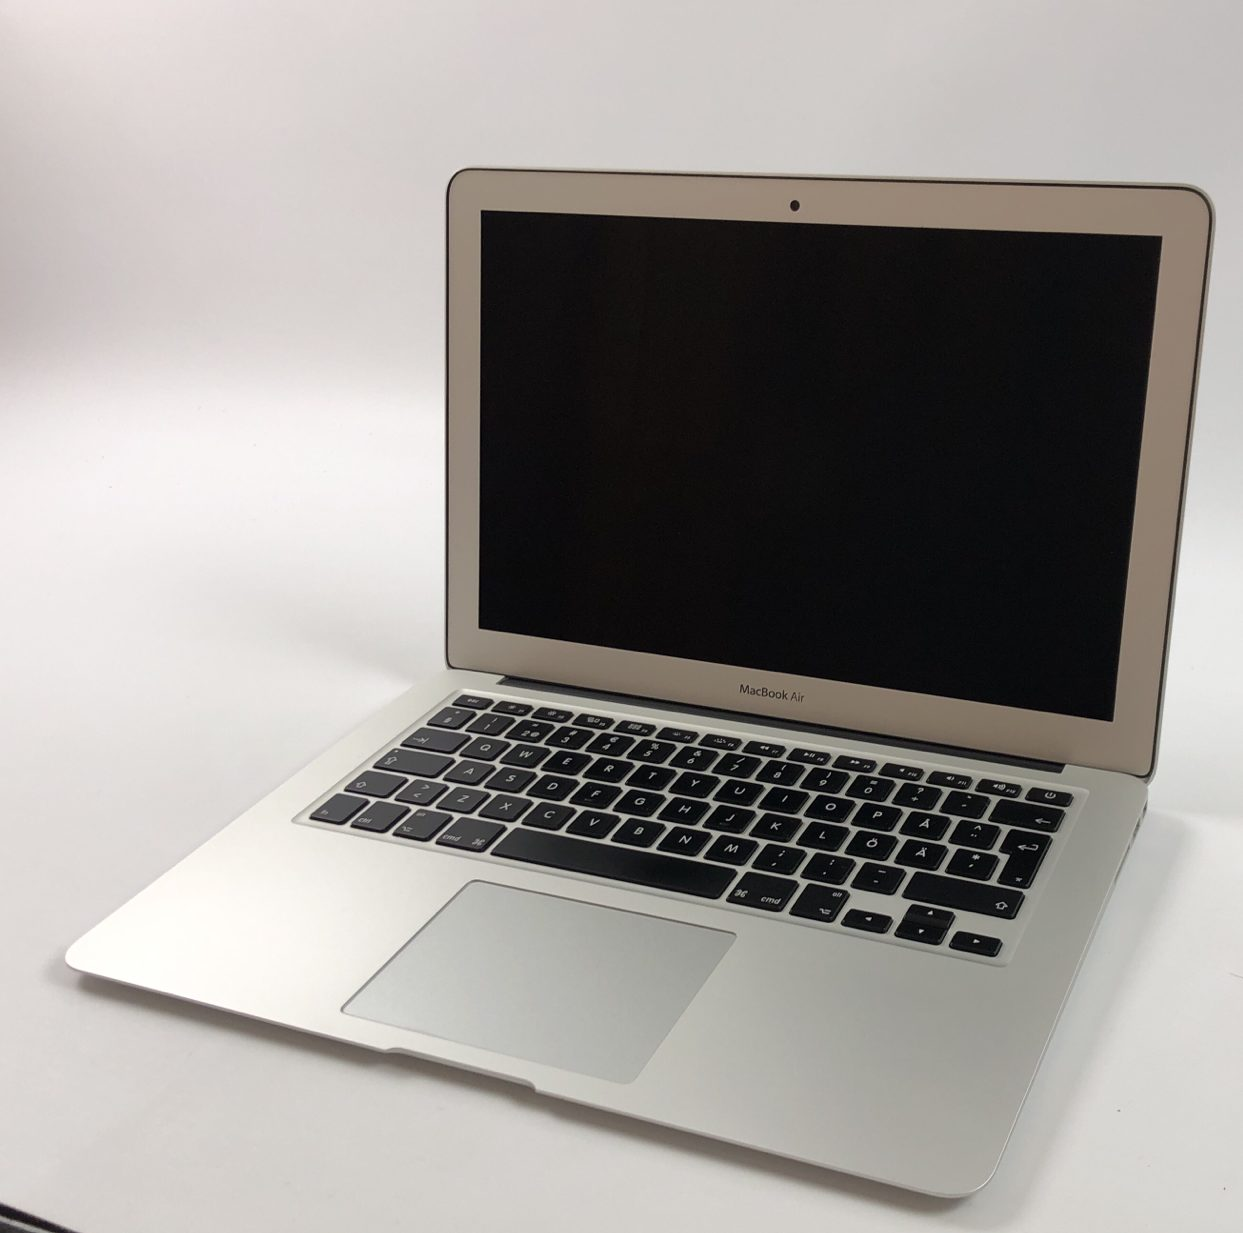 "MacBook Air 13"" Early 2015 (Intel Core i5 1.6 GHz 4 GB RAM 128 GB SSD), Intel Core i5 1.6 GHz, 4 GB RAM, 128 GB SSD, Kuva 1"